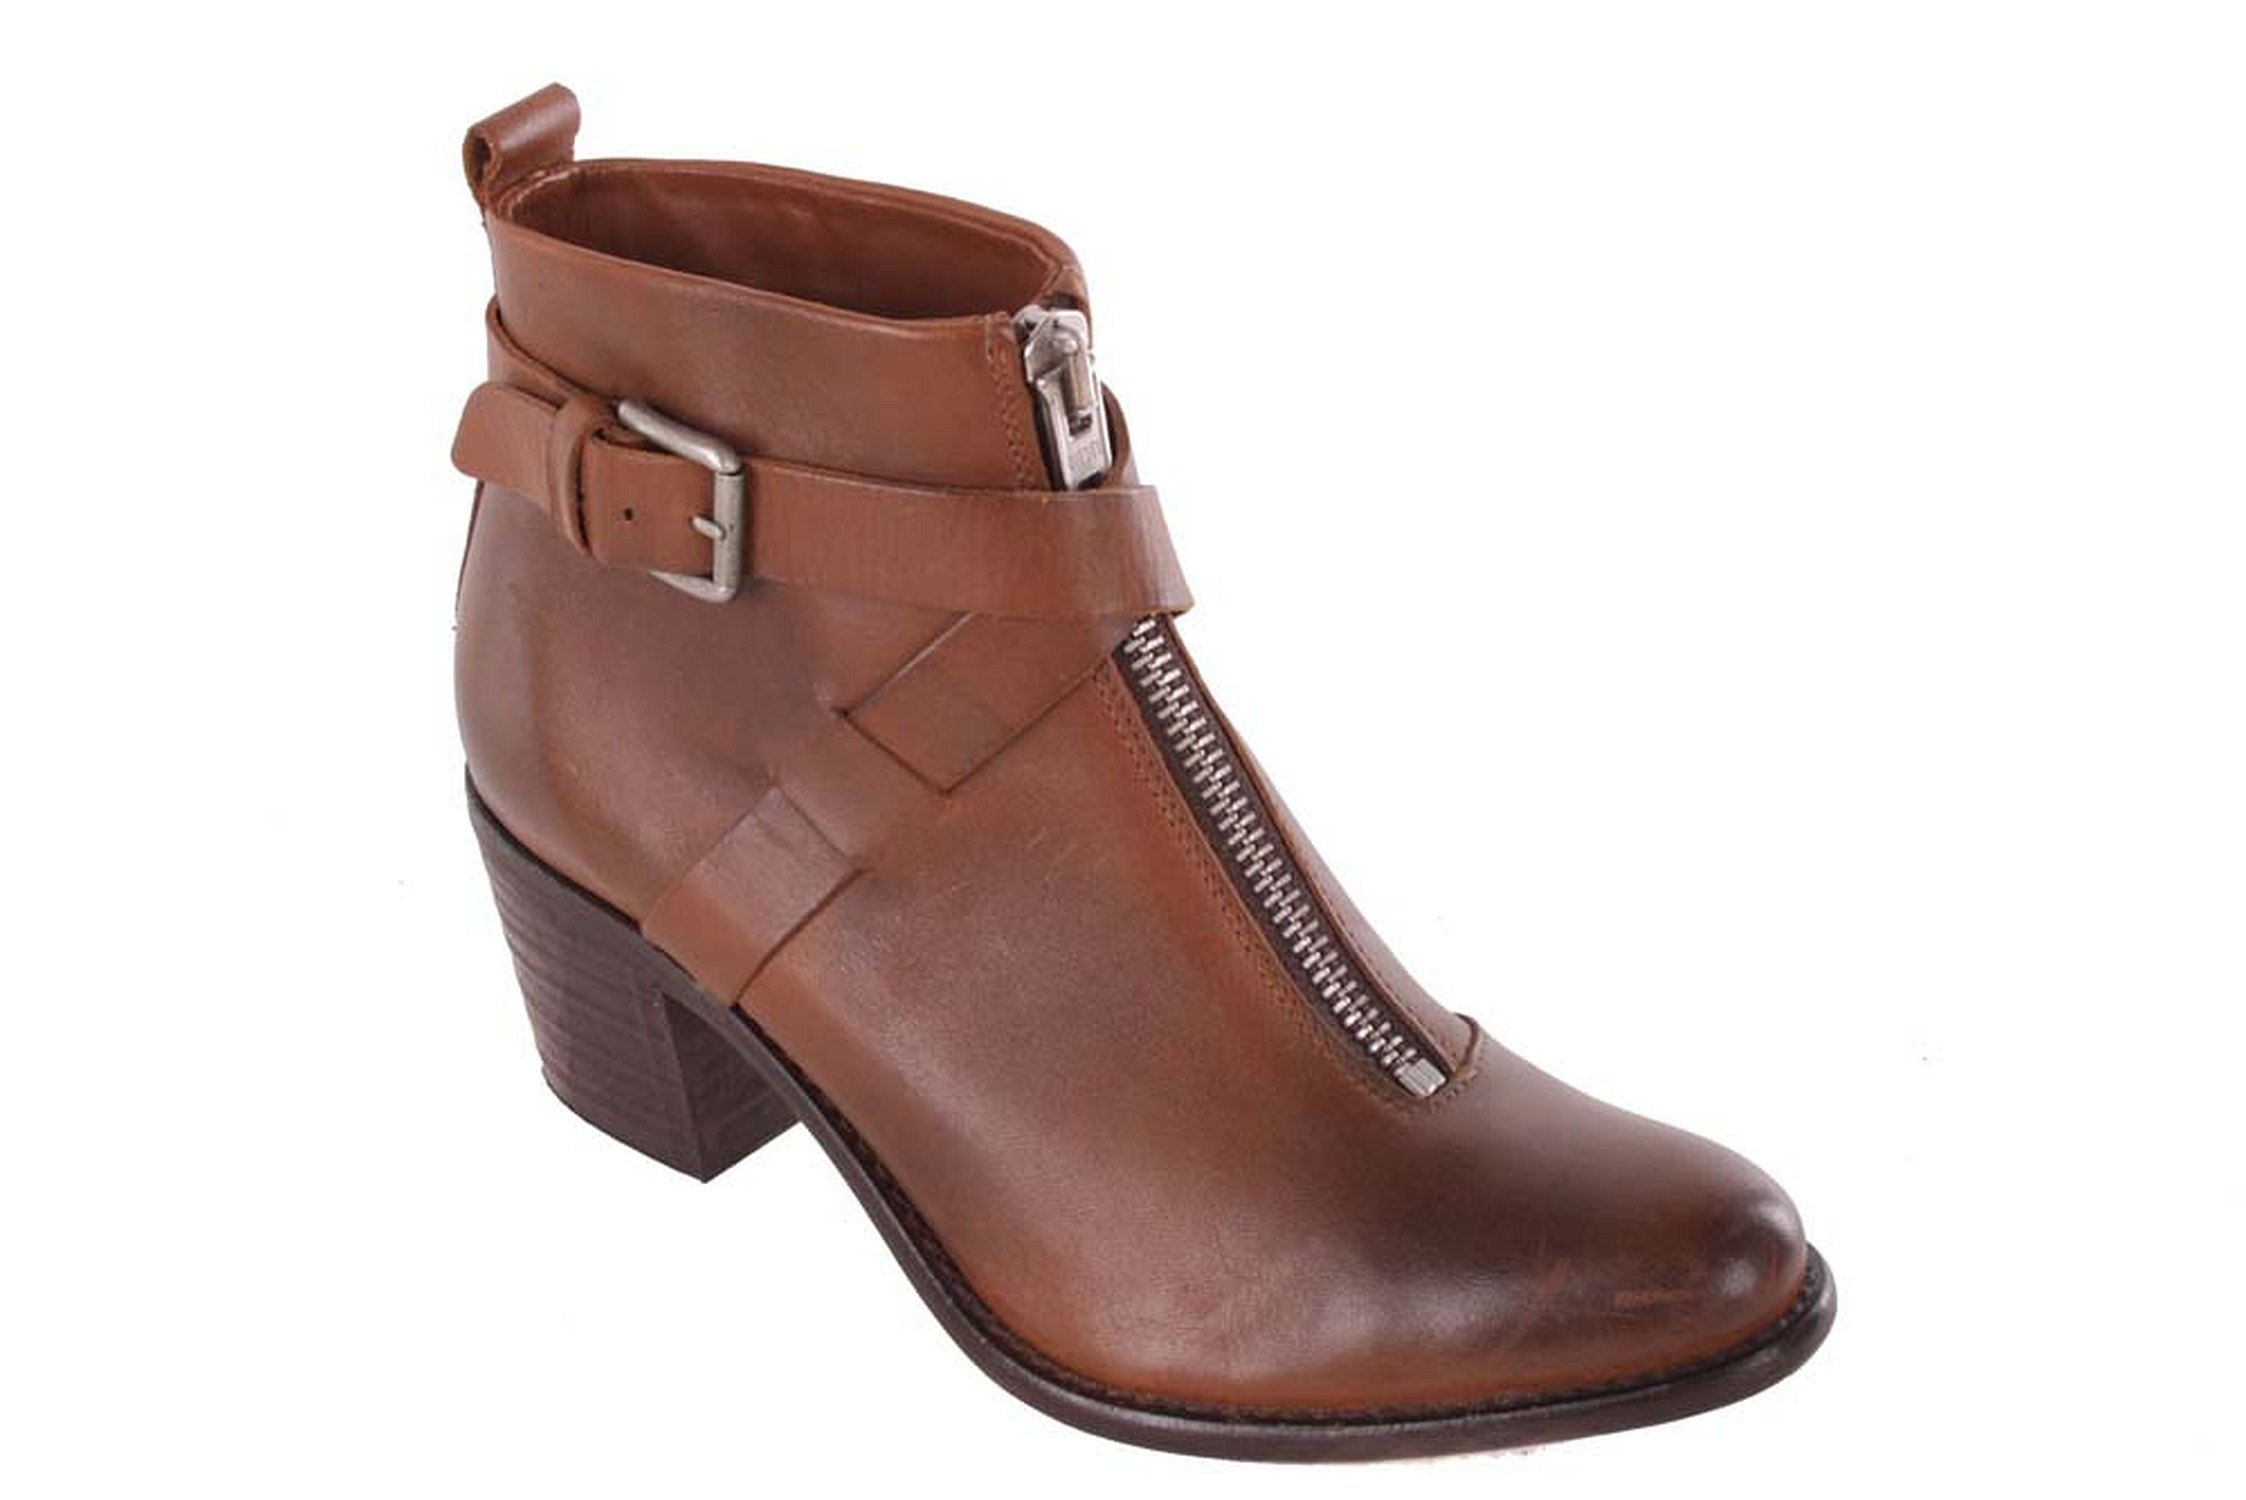 diesel damen boots stiefeletten braun chelsea show echtleder 180 ebay. Black Bedroom Furniture Sets. Home Design Ideas